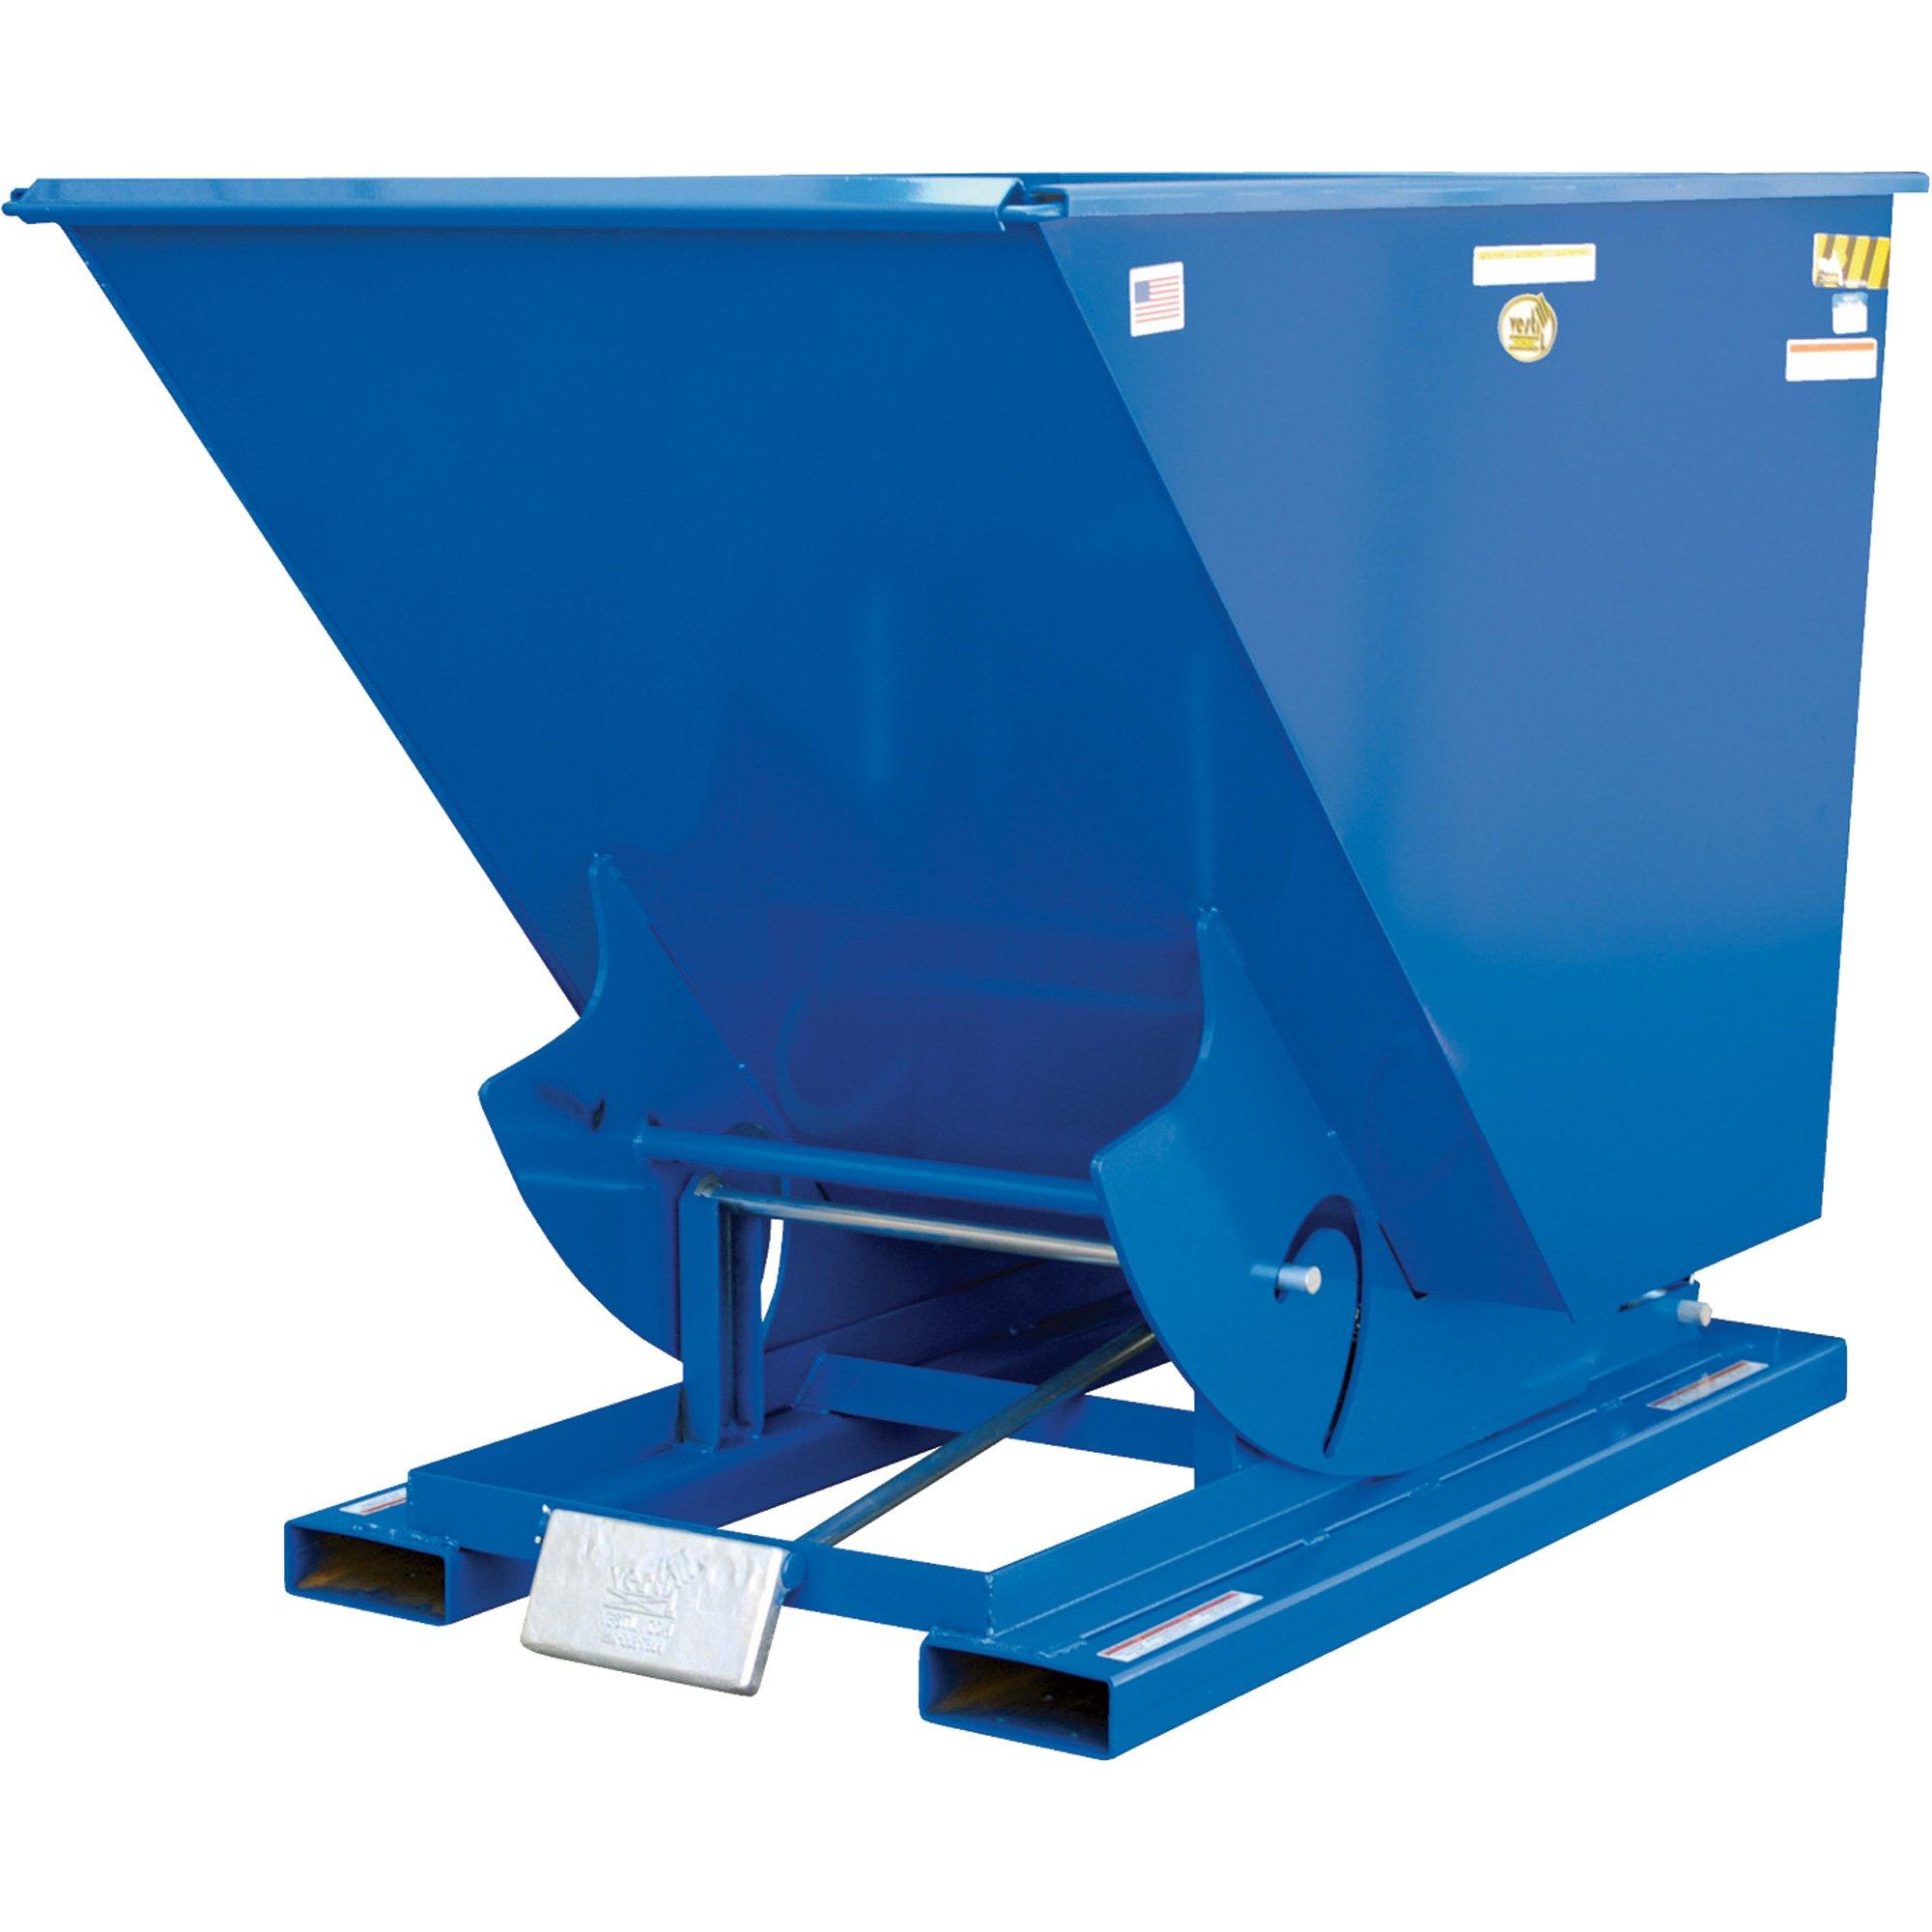 2 Cu. Yd. Self-Dumping Steel Hopper with Bump Release, 4000 Lb., Vestil D-200-MD, Lot of 1